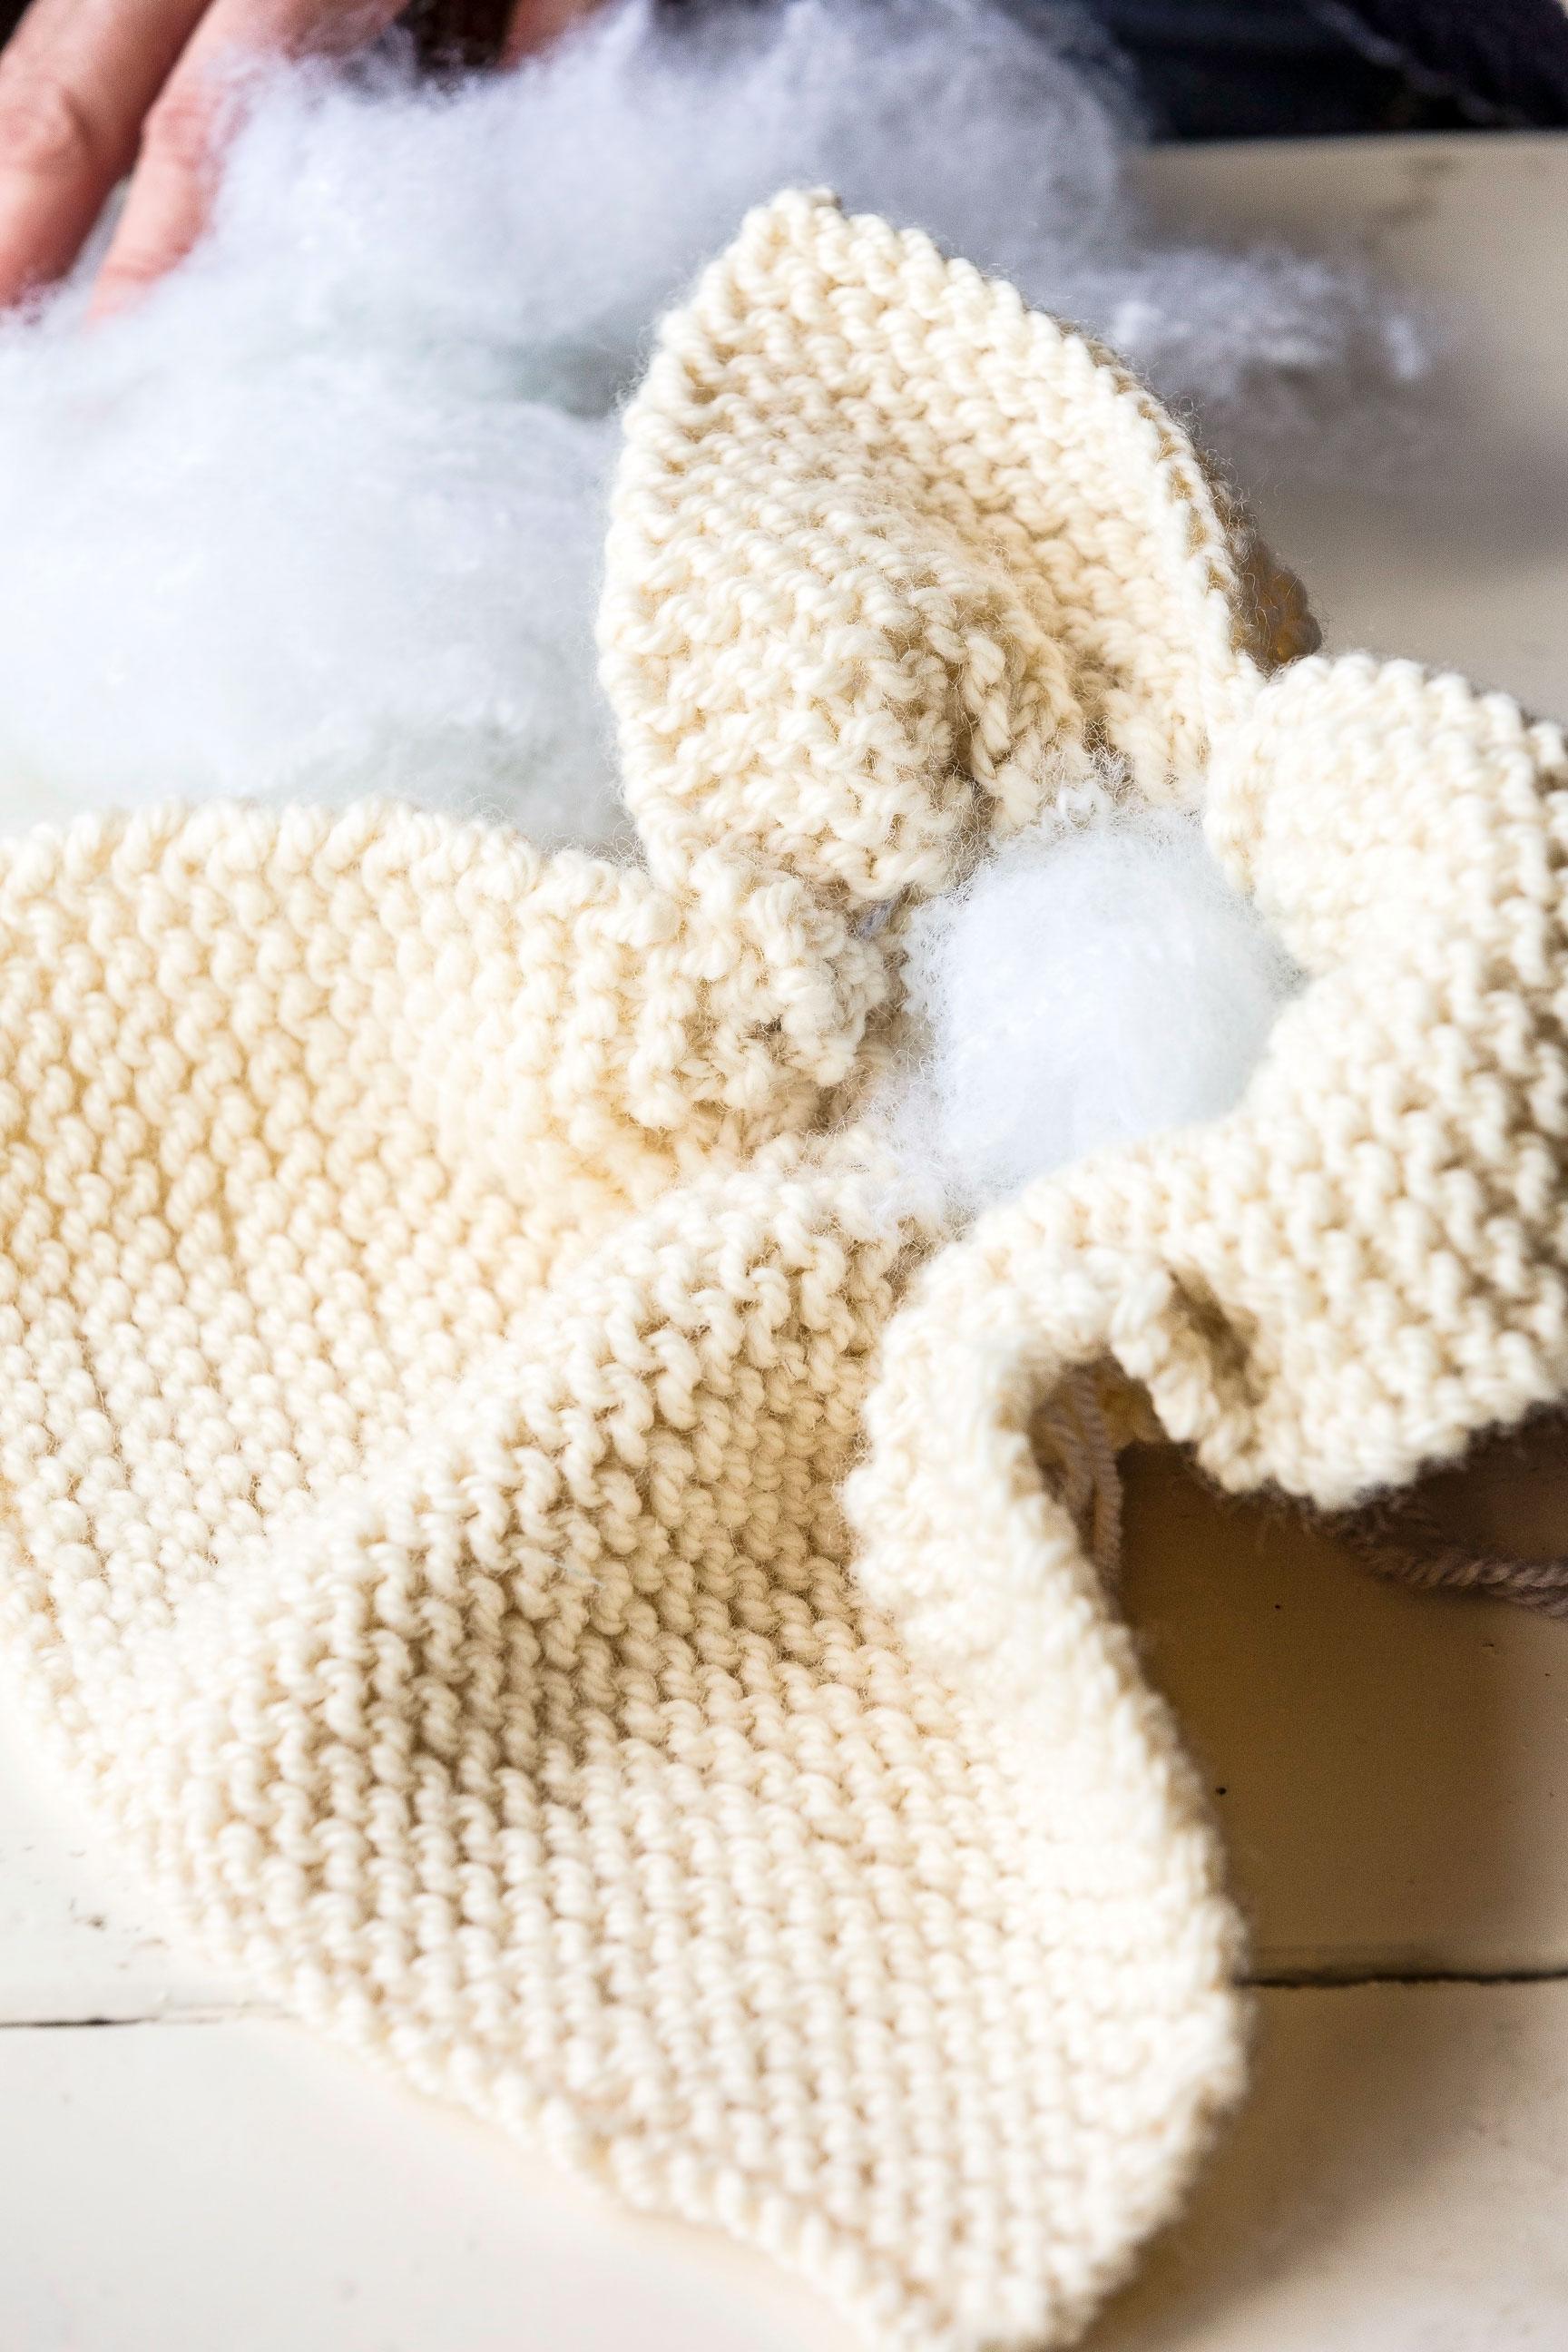 Craft-project-fabric-bunnies-3.jpg